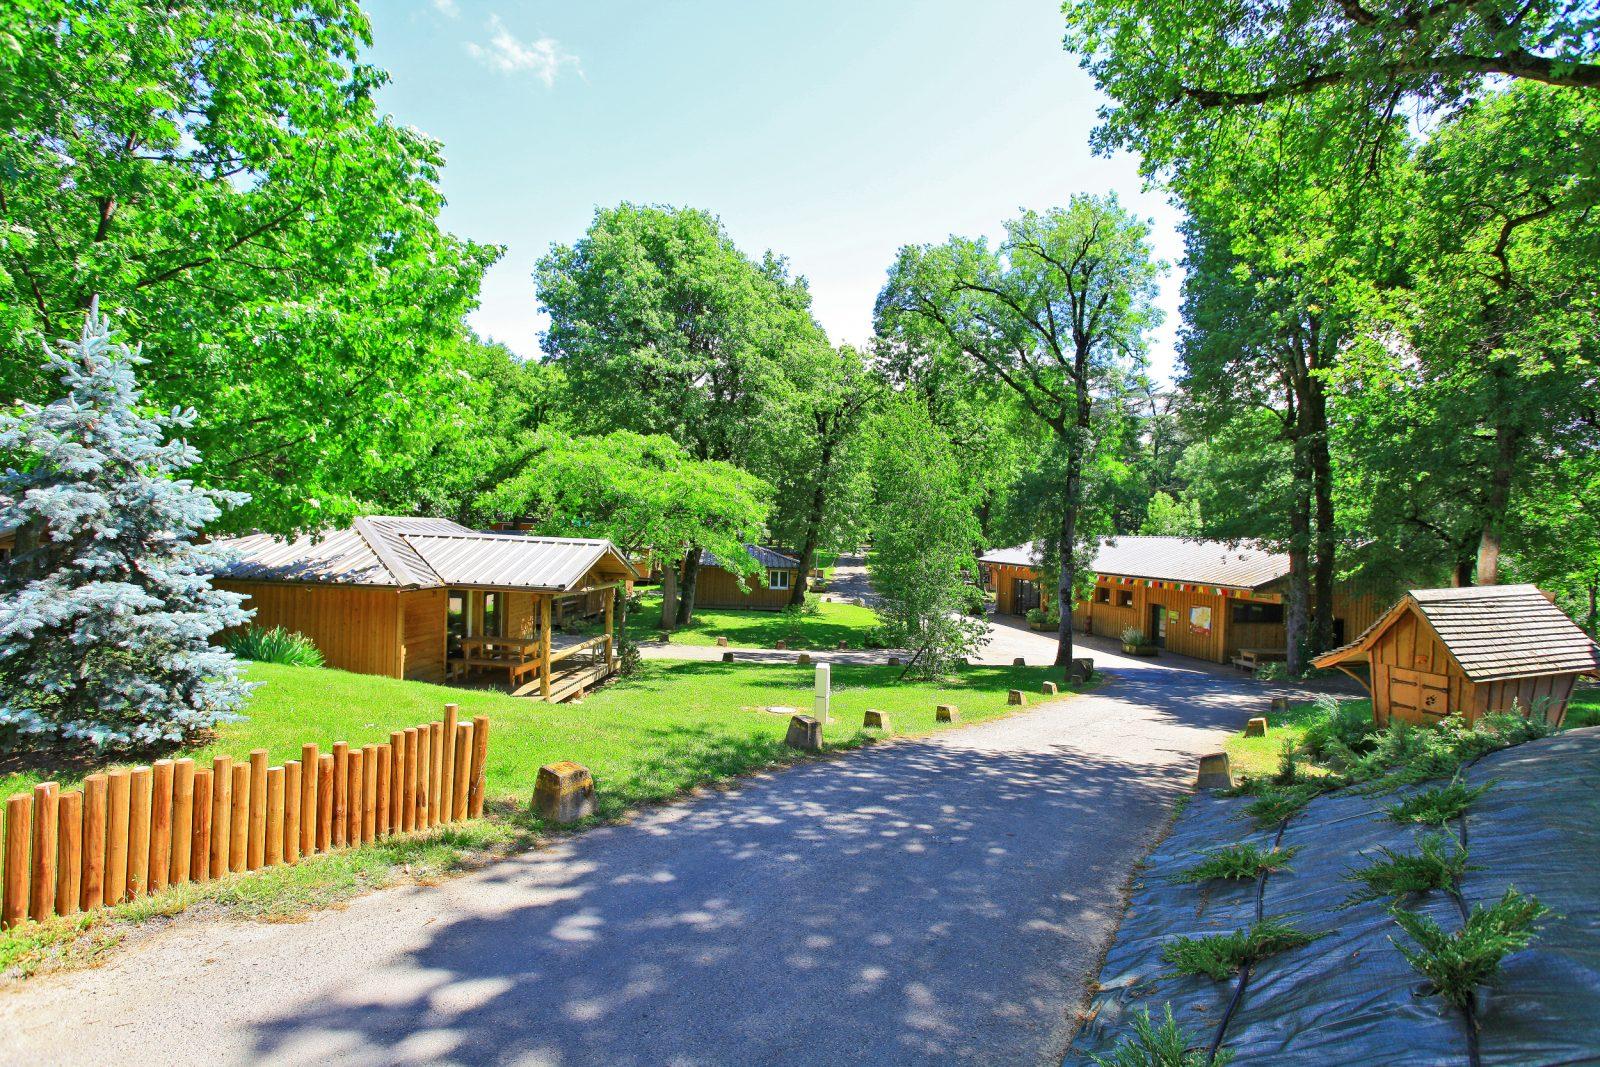 Albirondack Camping Tarn Espaces verts